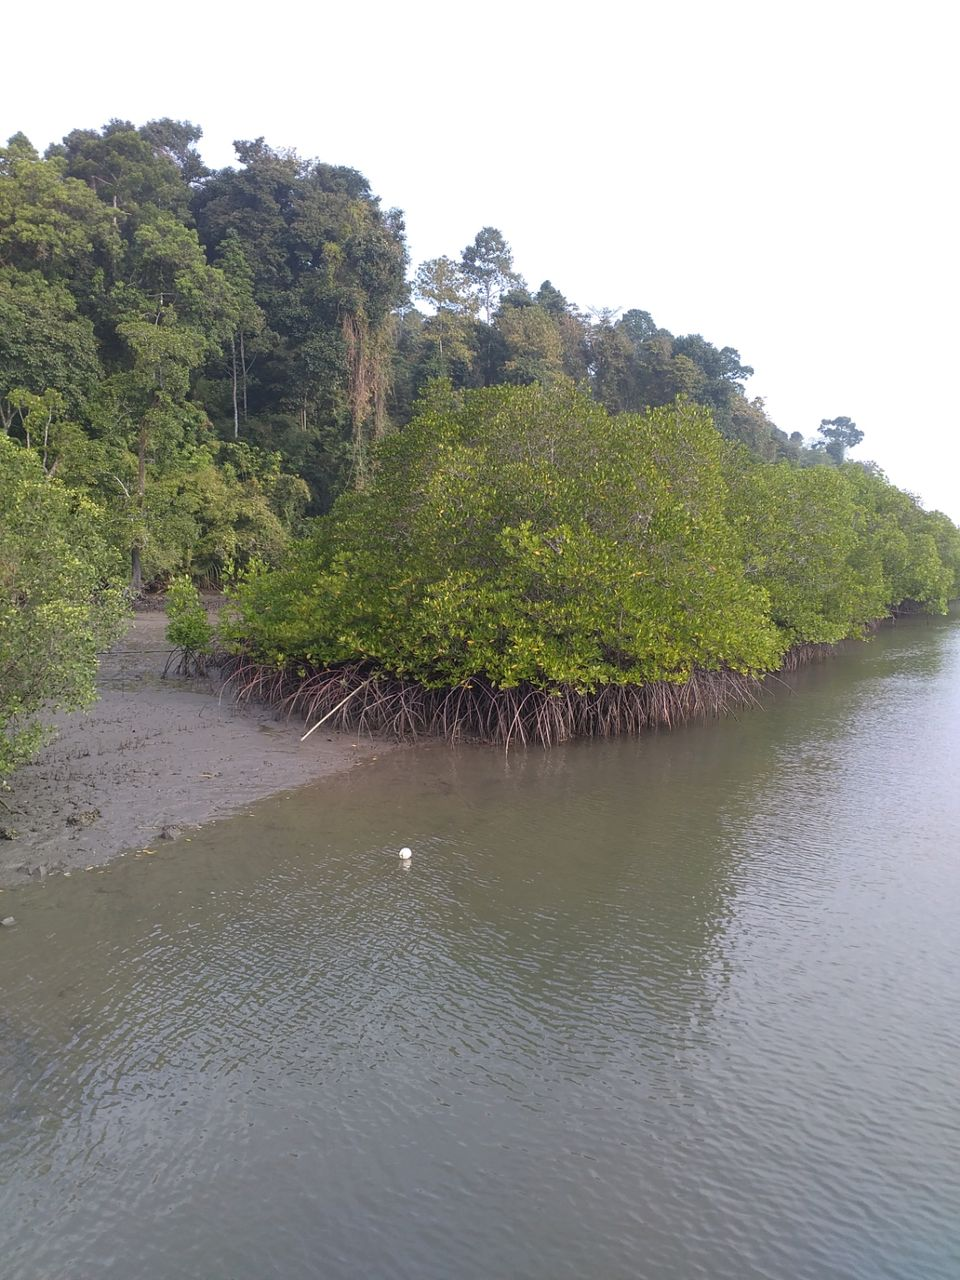 Photos of Meandering through the Mangrove creeks at Baratang Island – A boat ride from Nilambur Jetty. 1/1 by Karim S A